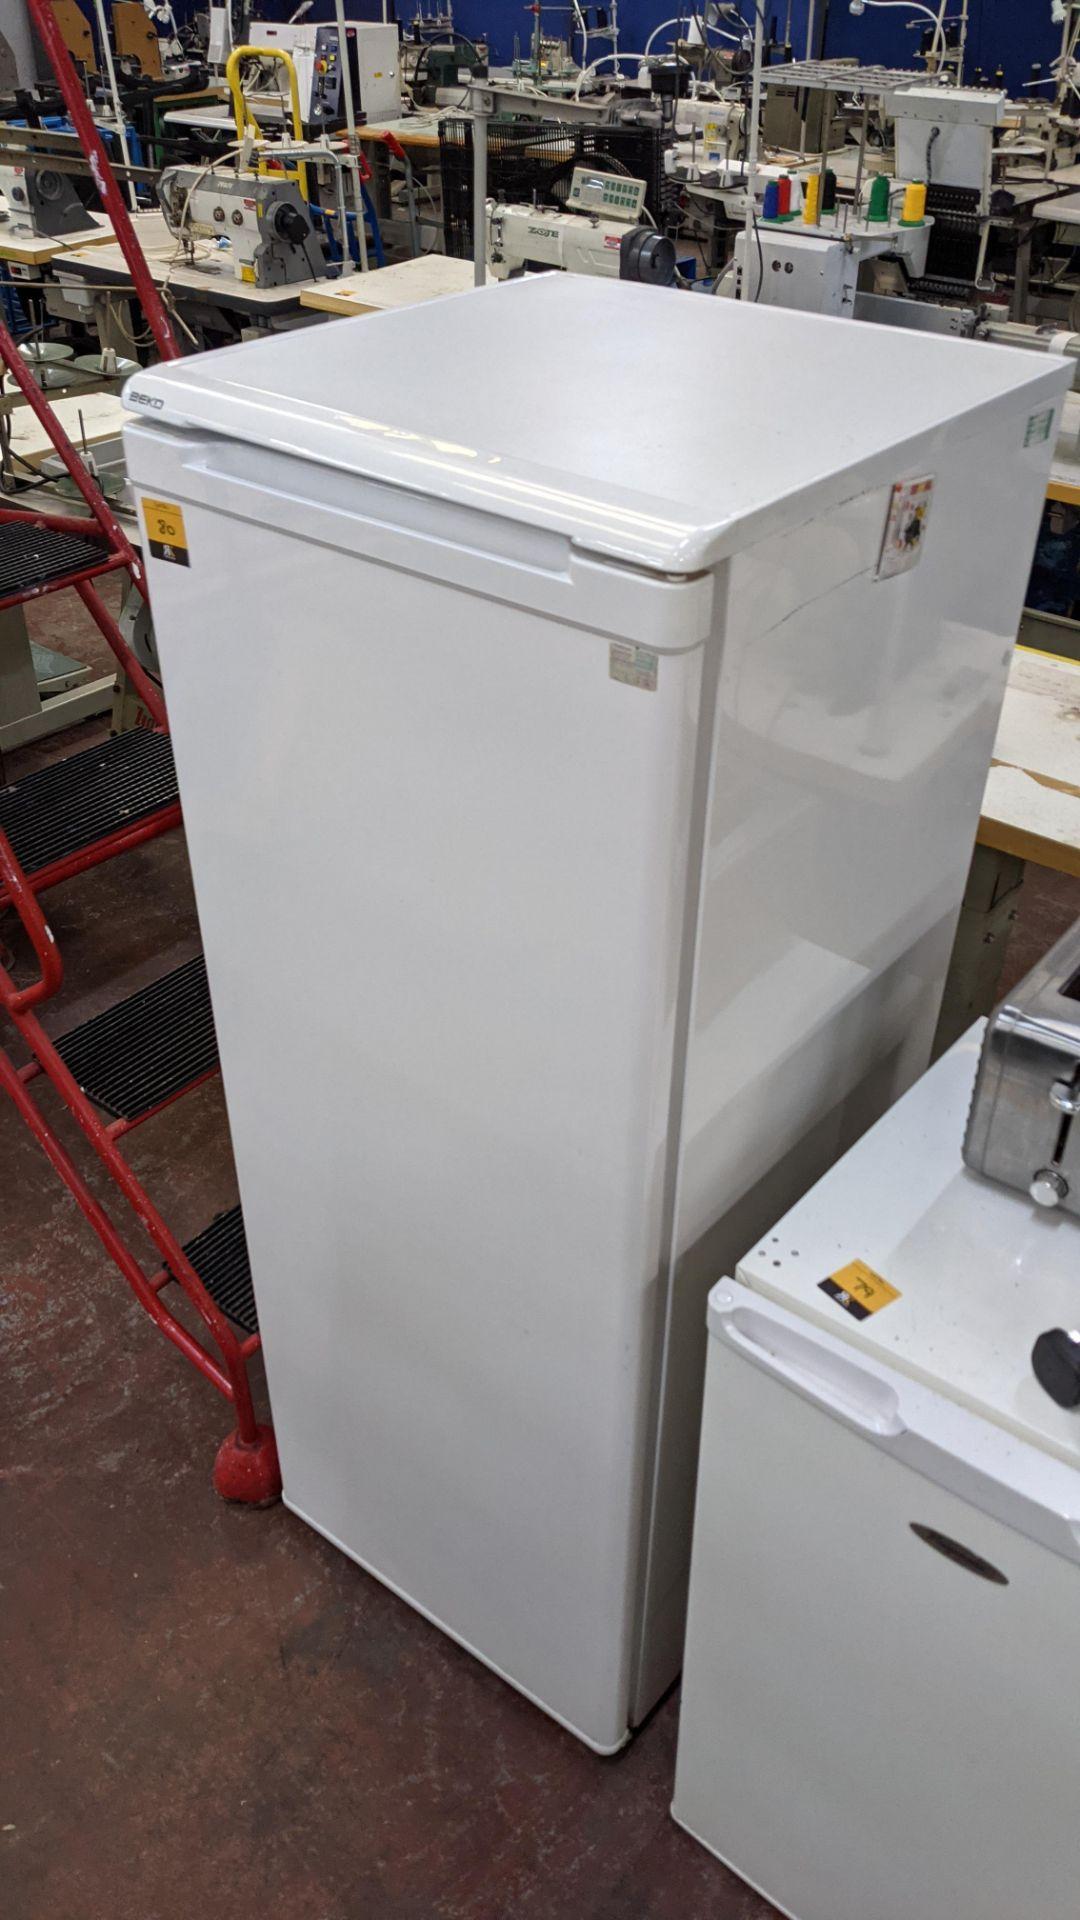 Beko tall fridge - Image 2 of 5